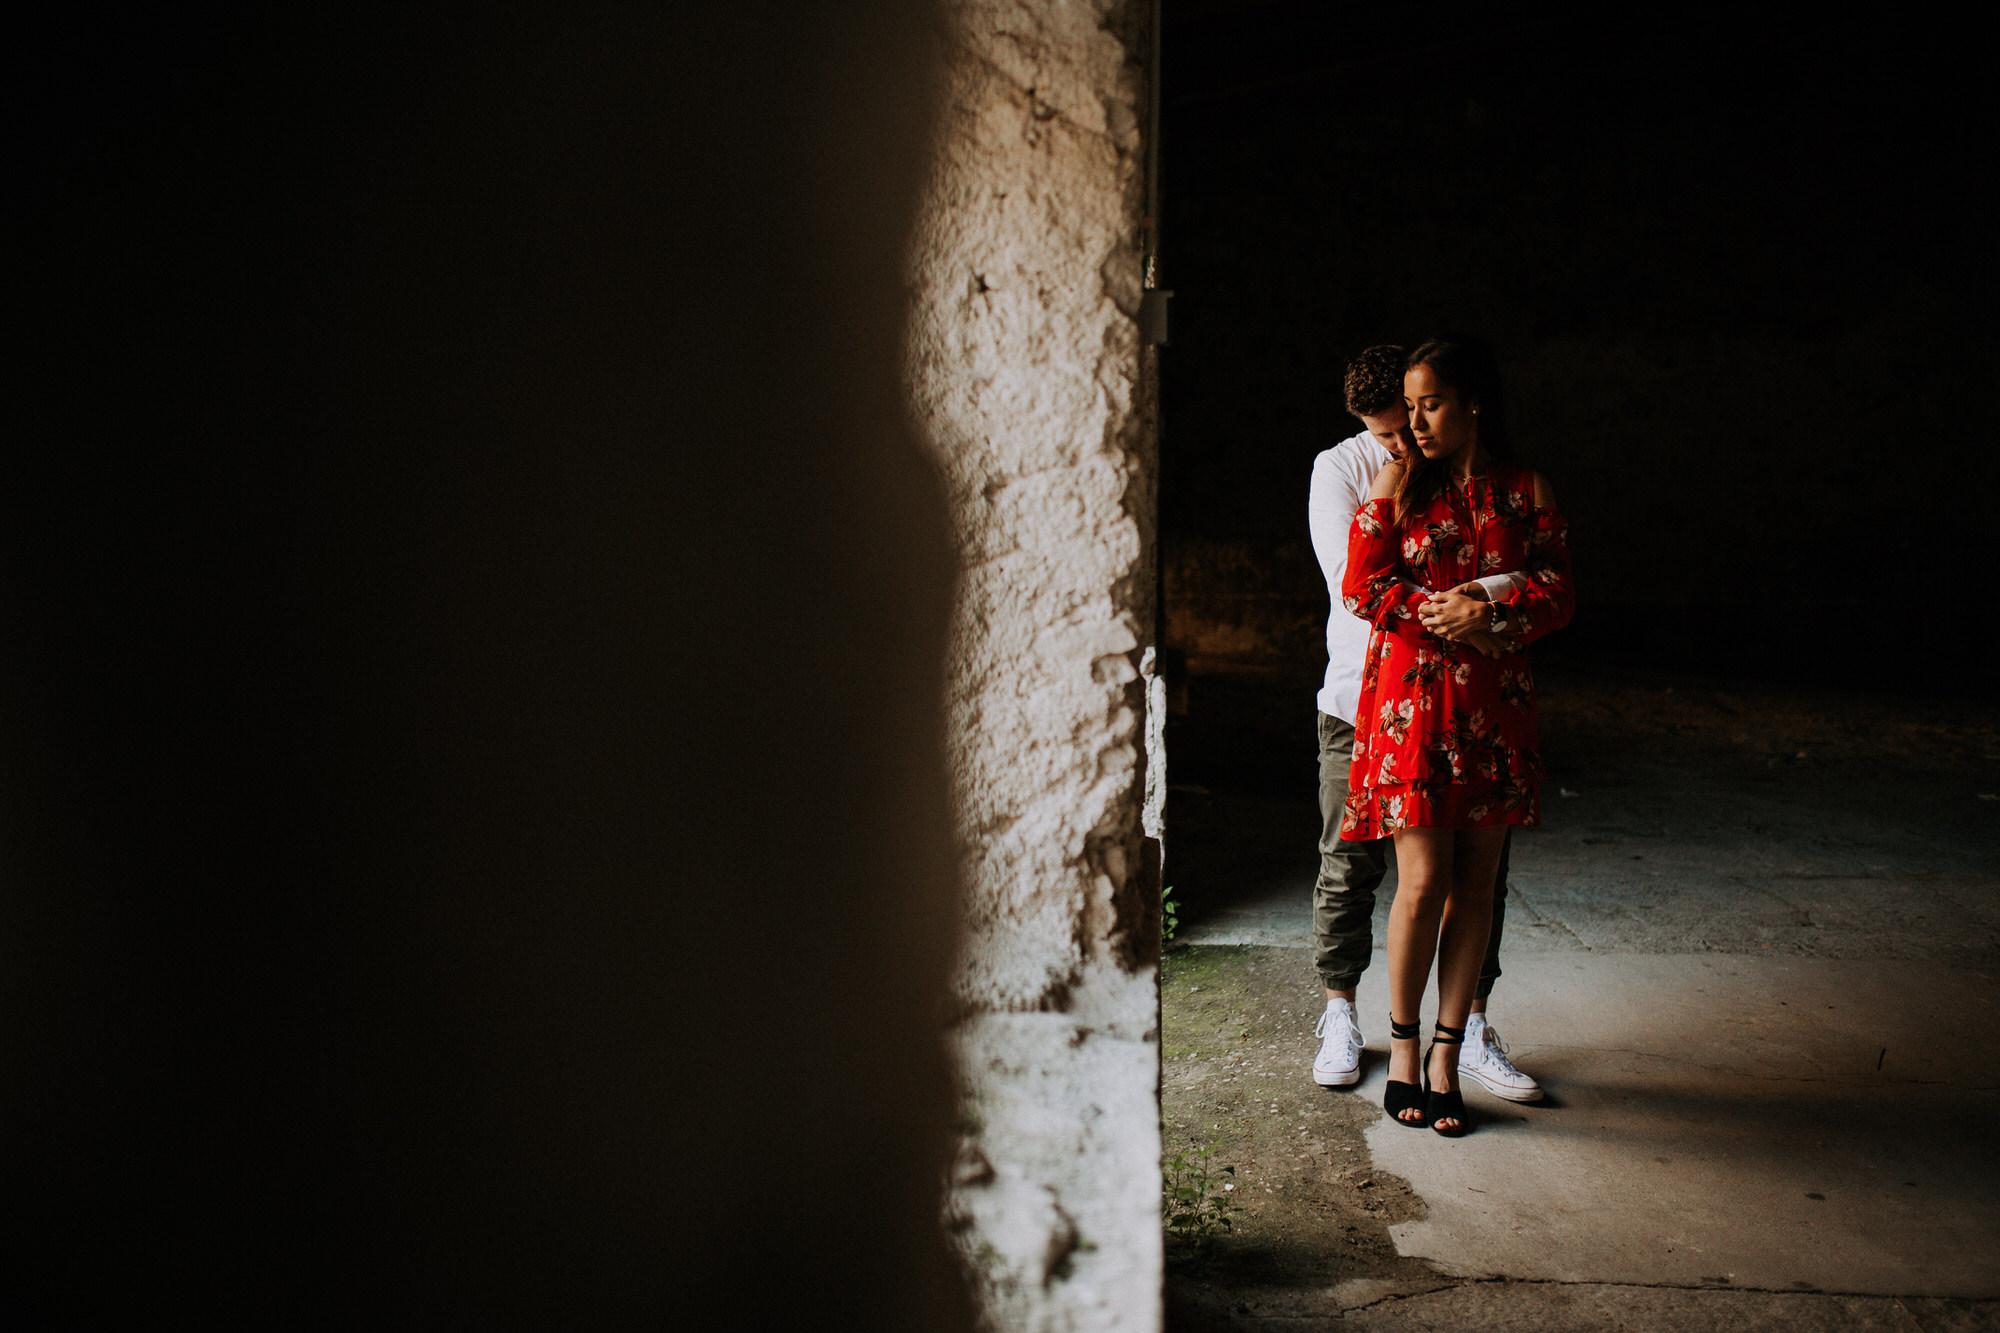 27-sessao-noivado-engagement-love-session-Sintra-lisboa-town-wedding-photography-photographer-natural-best-venue-planner-destination-filipe-santiago-fotografia-lifestyle-documentary